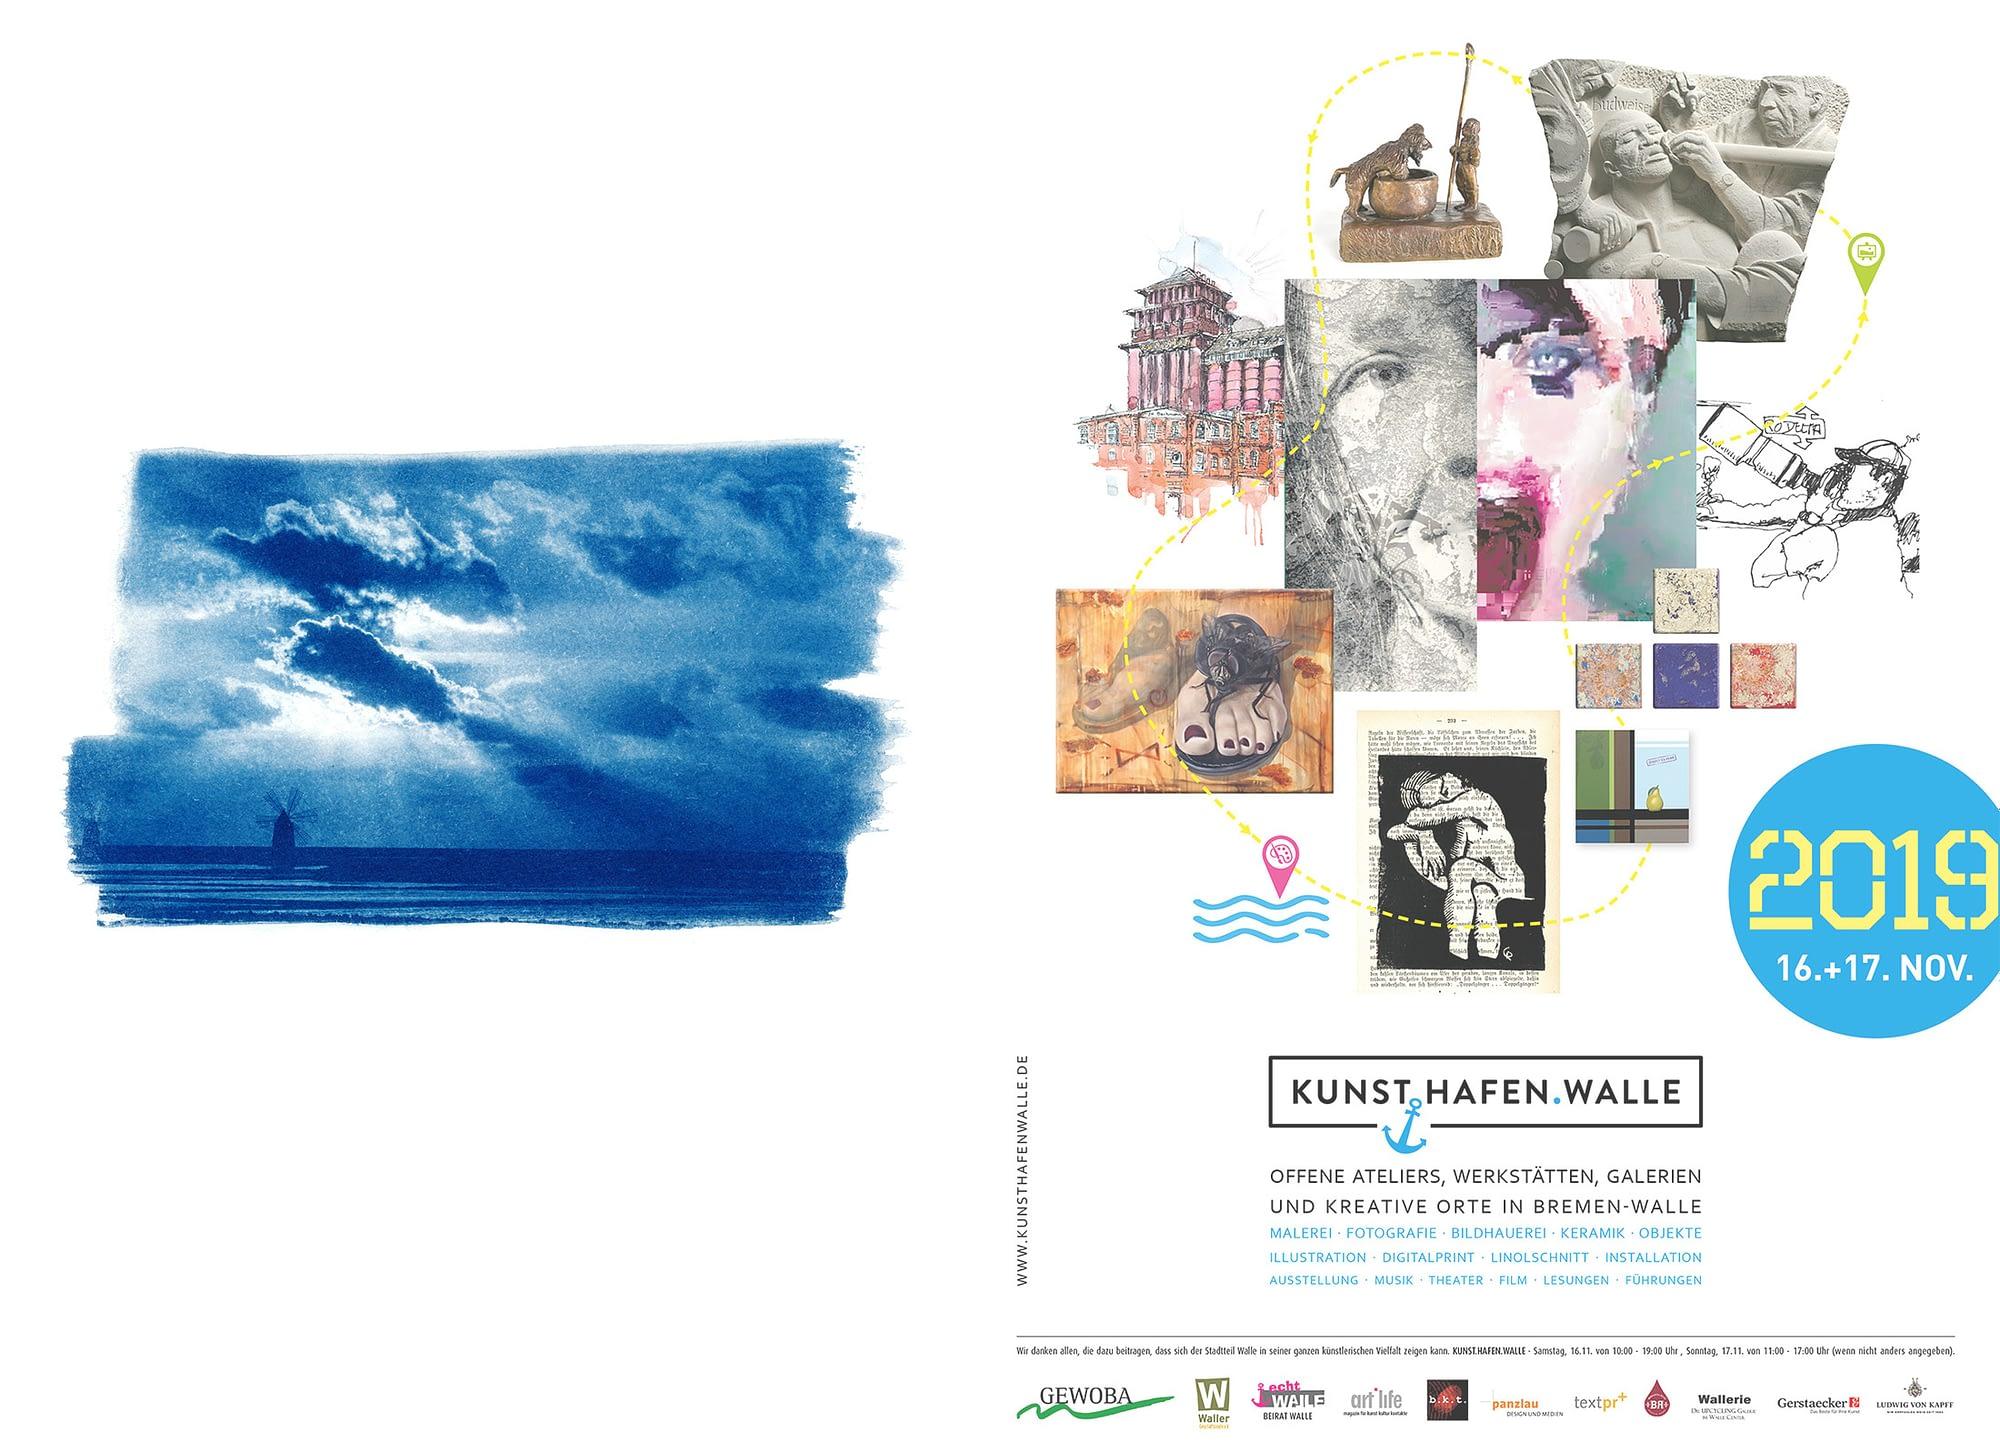 Fotografie, Olmo Fotografik, Kunsthafen Walle, Kunst.Hafen.Walle, Cyanotype, Cyanotypie